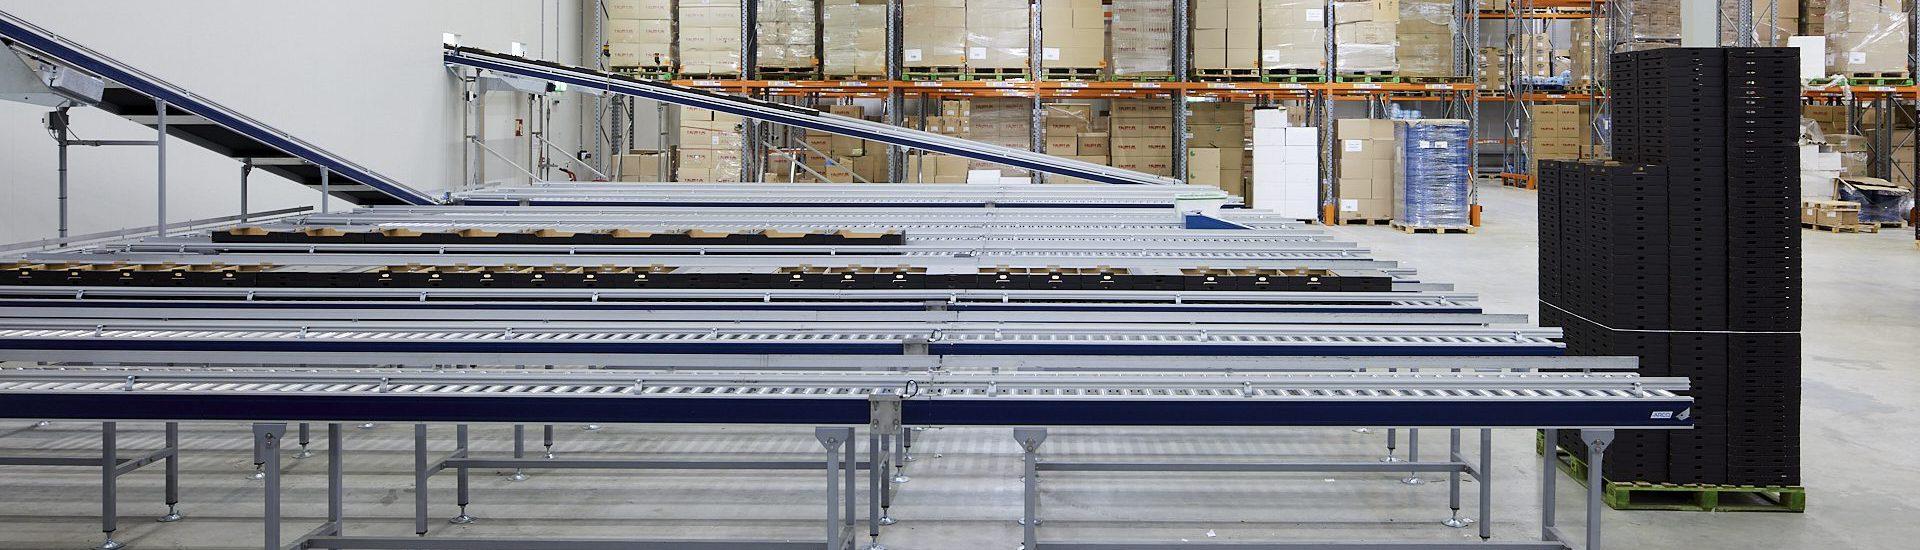 Supply Chain & Internal Logistics.